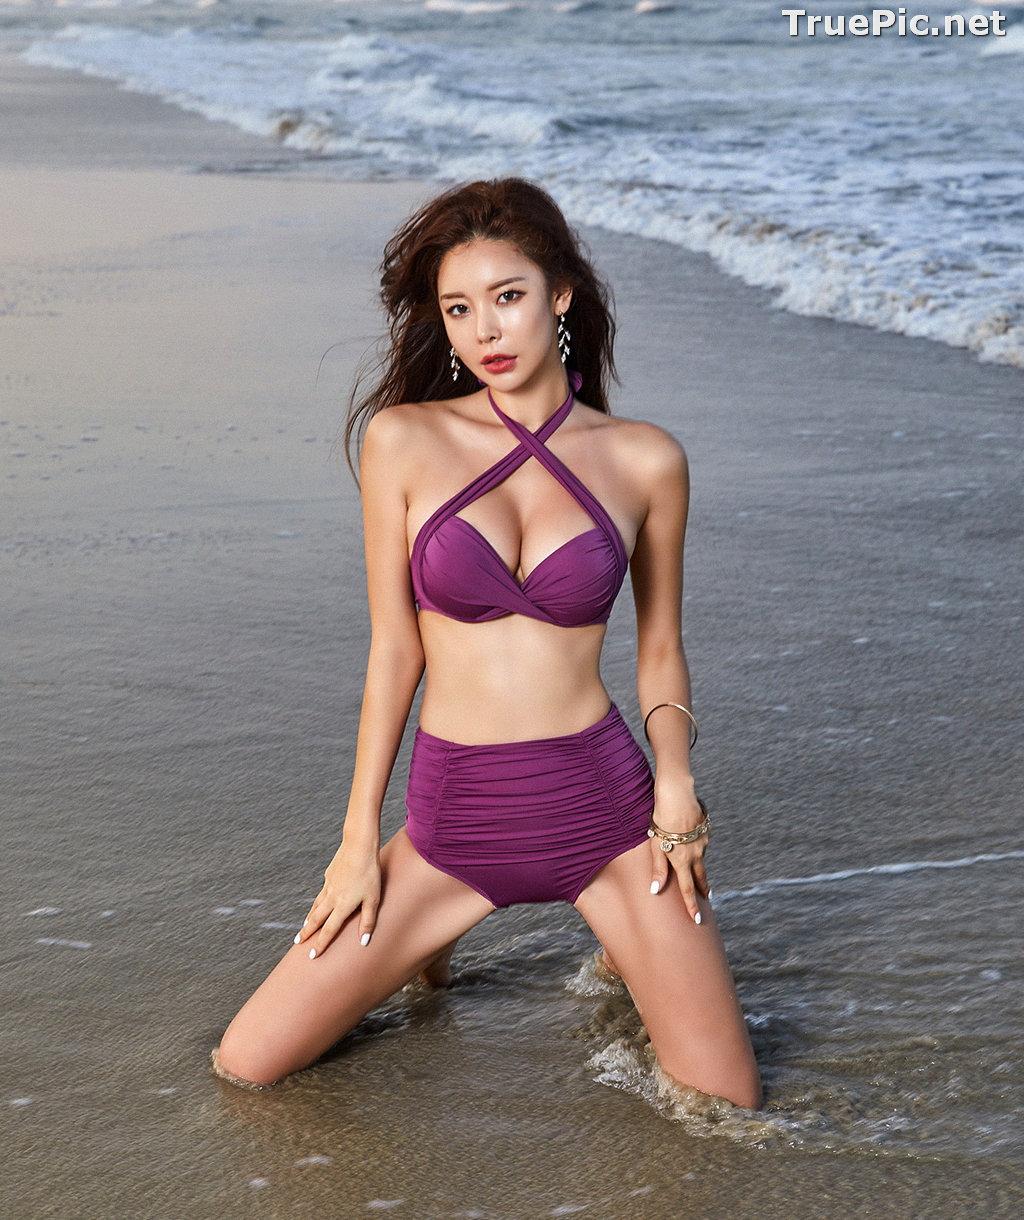 Image Park Da Hyun - Korean Fashion Model - RoseMellow Purple Bikini - TruePic.net - Picture-3